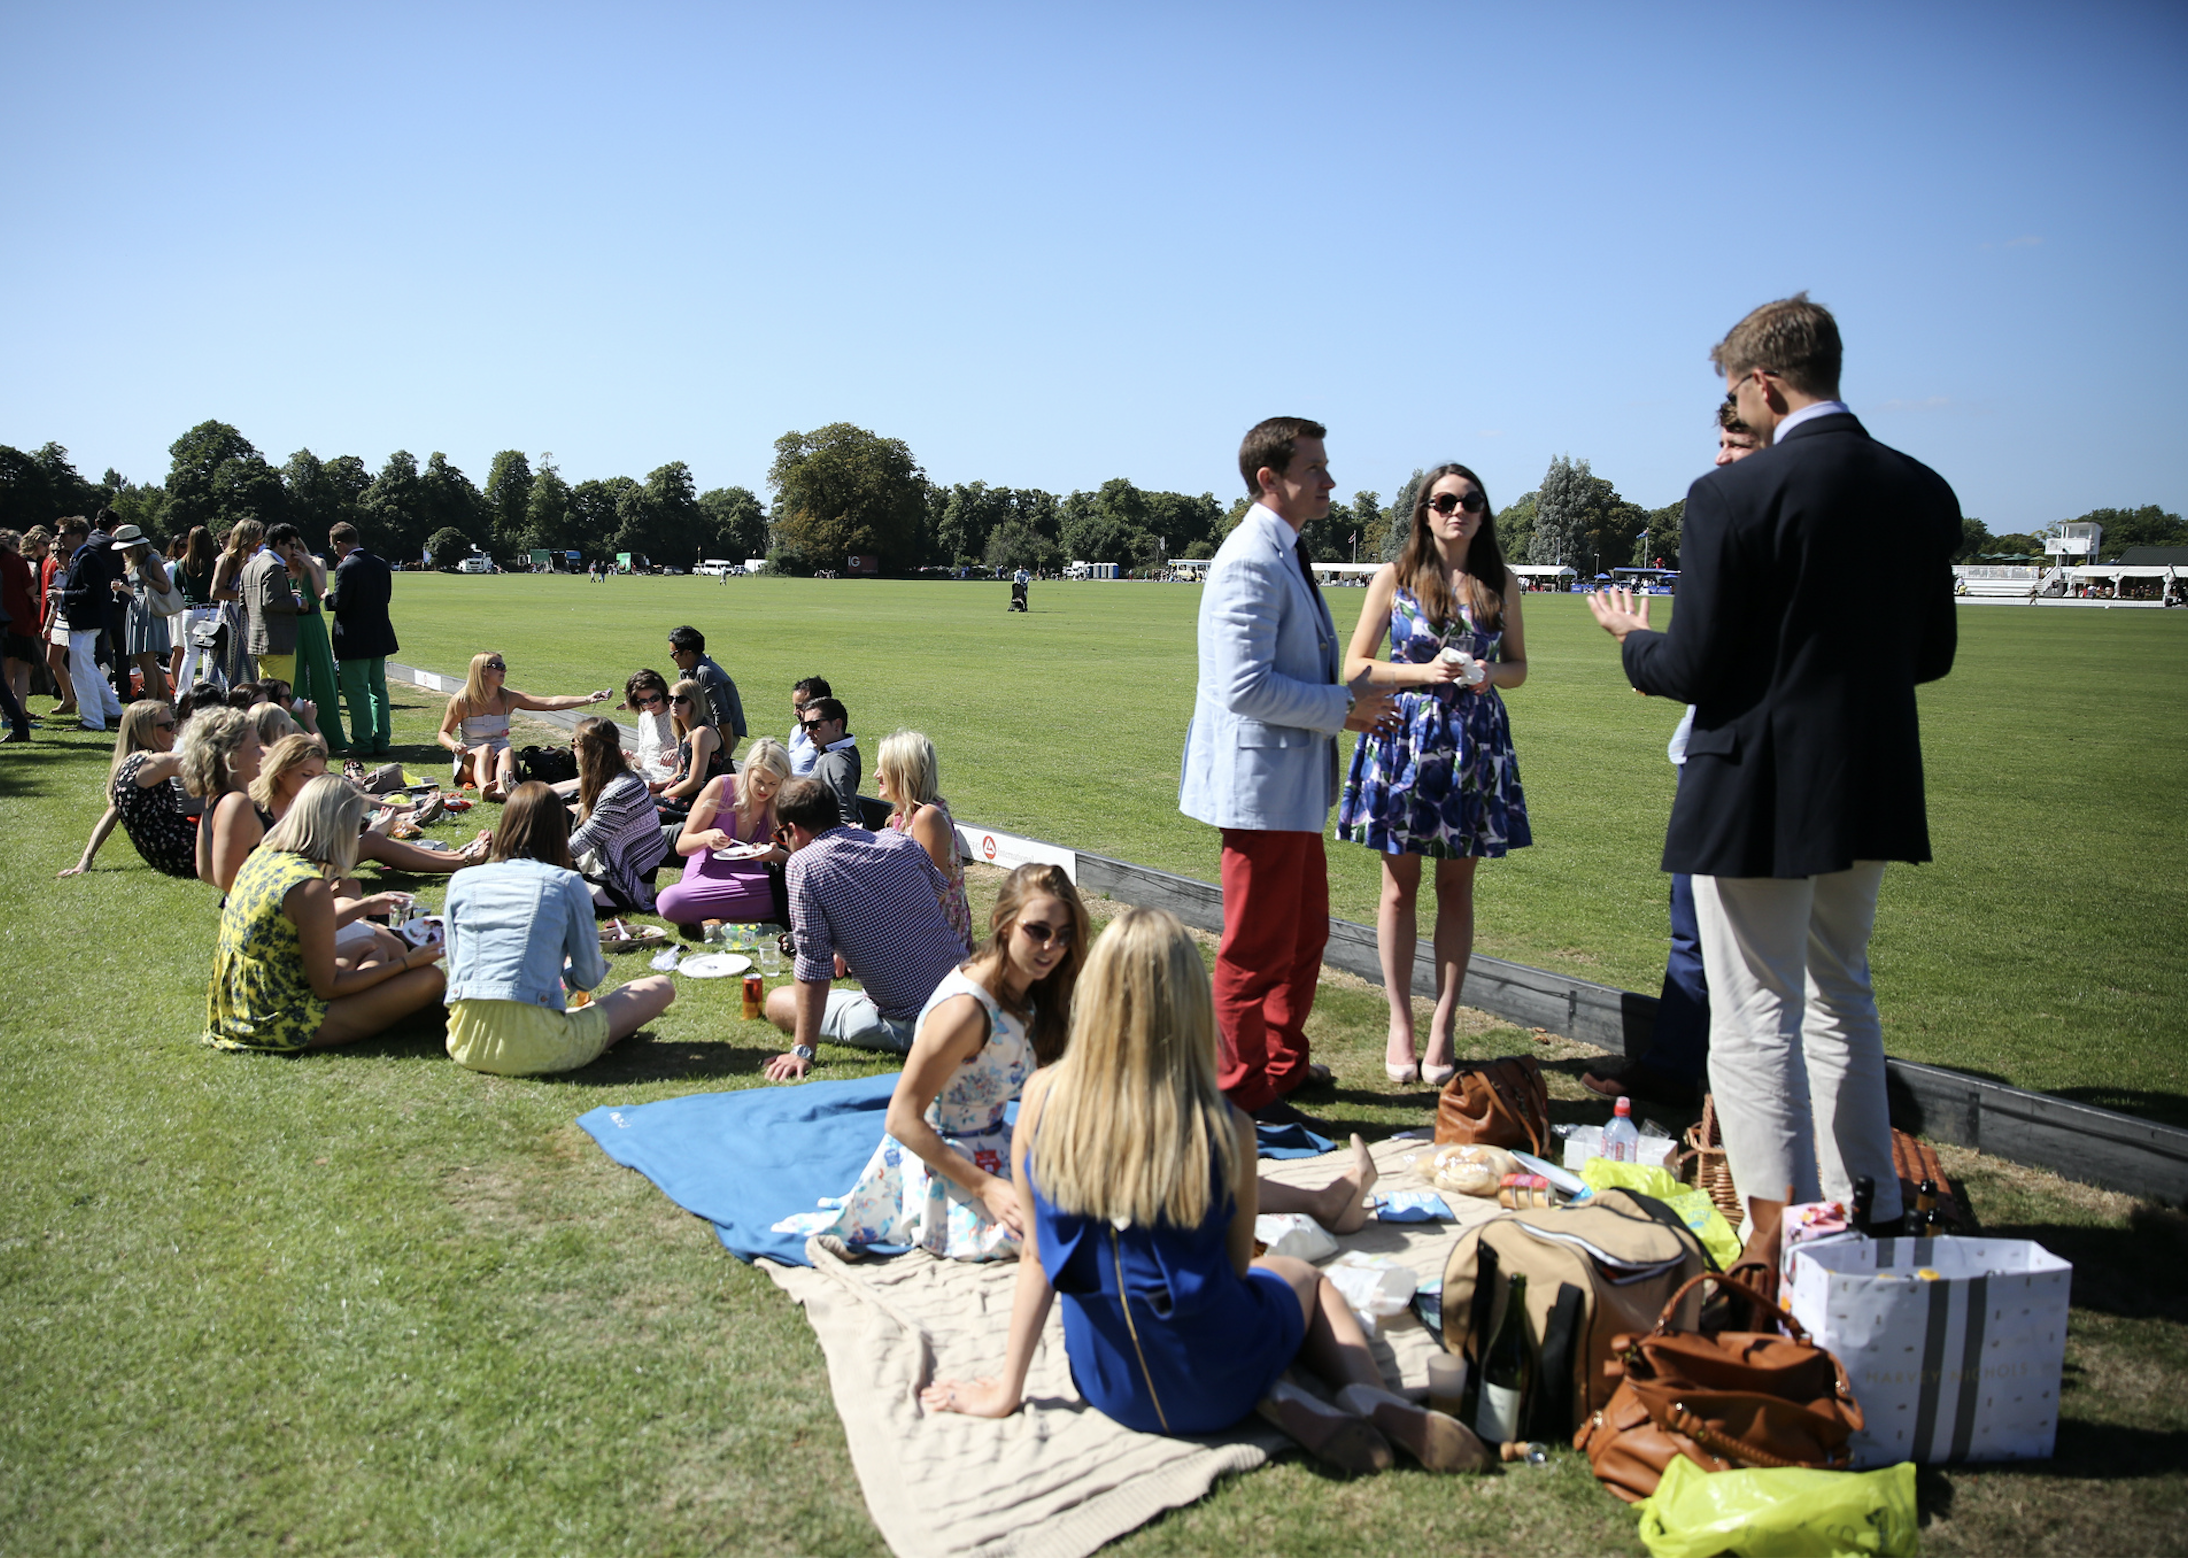 Fun in sun - enjoying a picnic at the polo